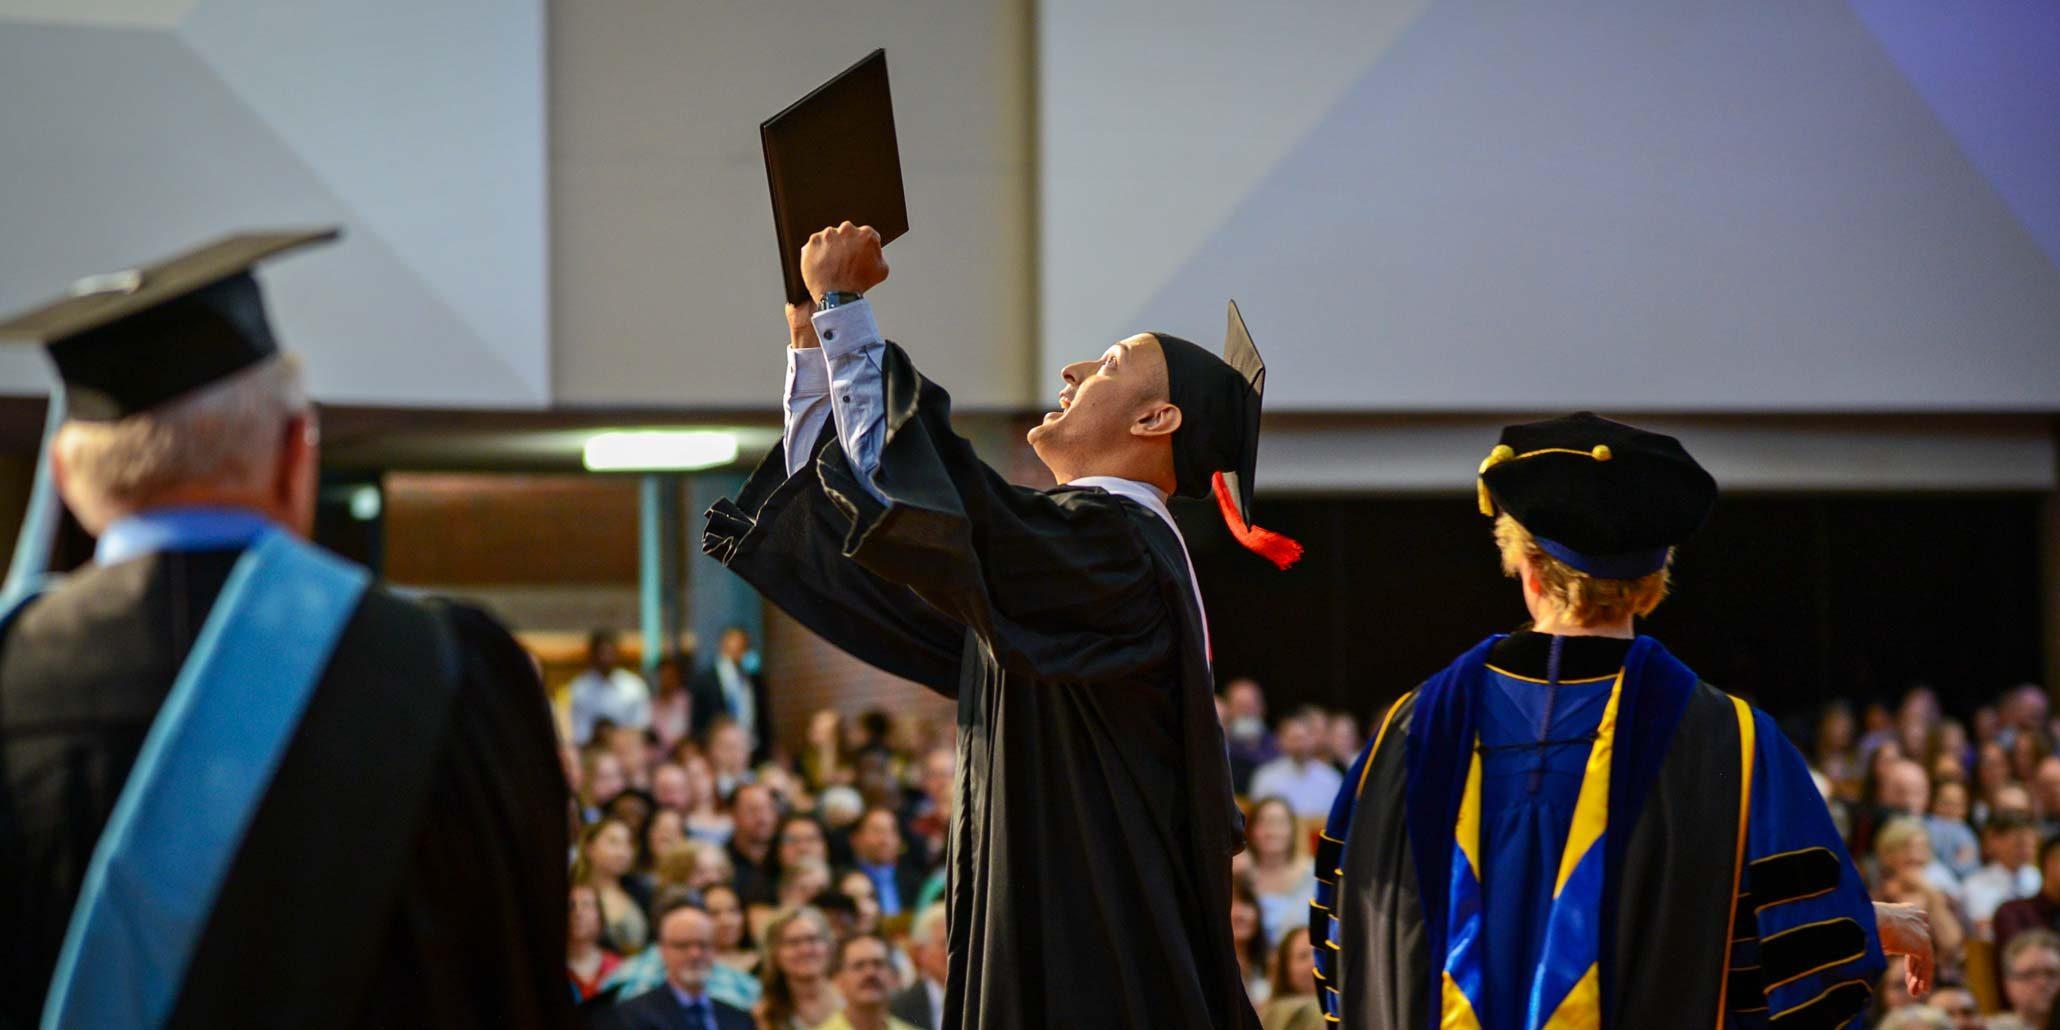 Union College Graduation 2020.Graduation Information Union College